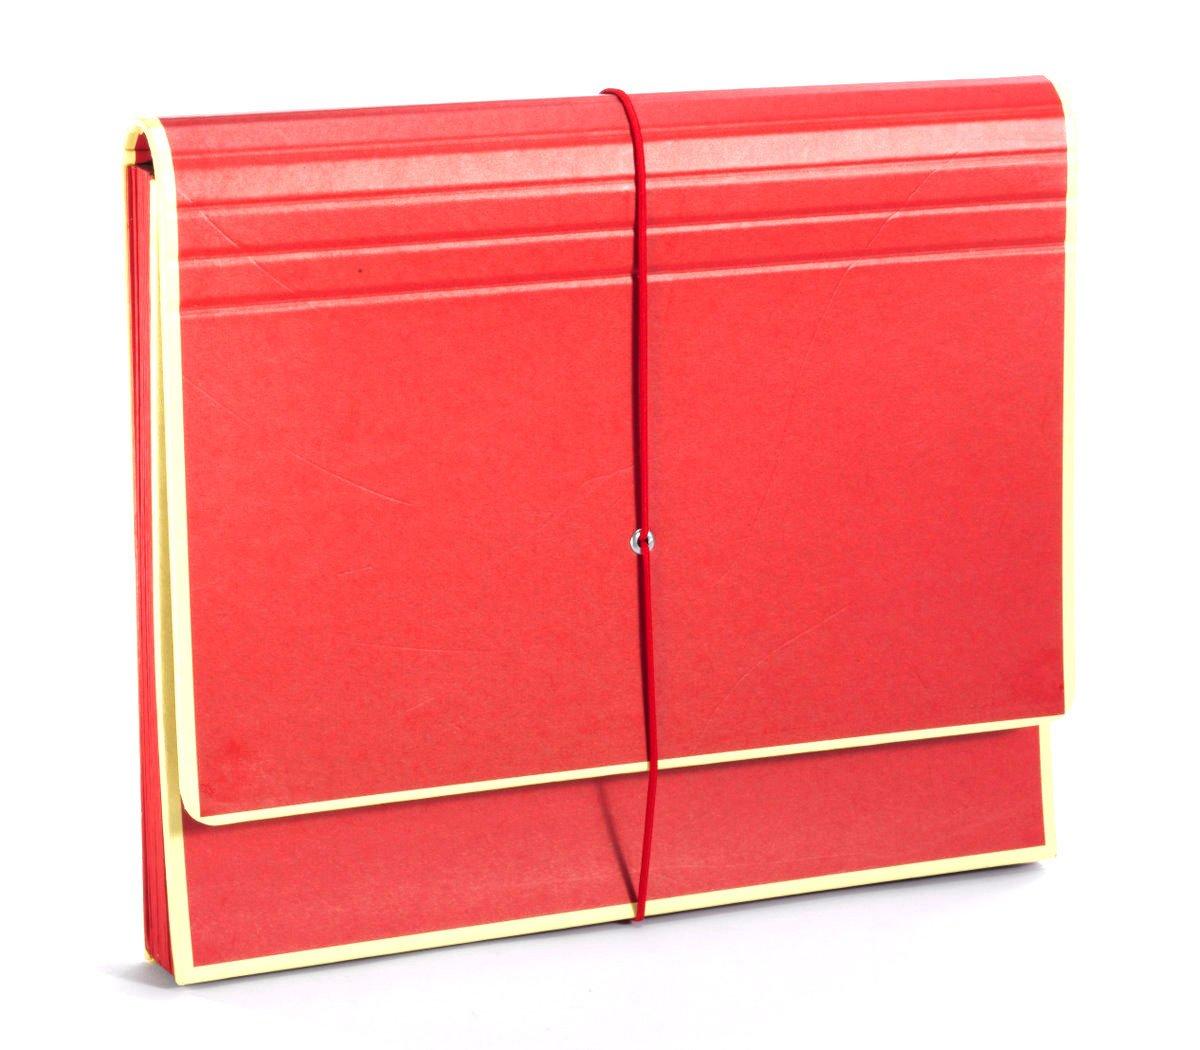 Beanbone 'The Accordion'' Red +++ Storage Binder